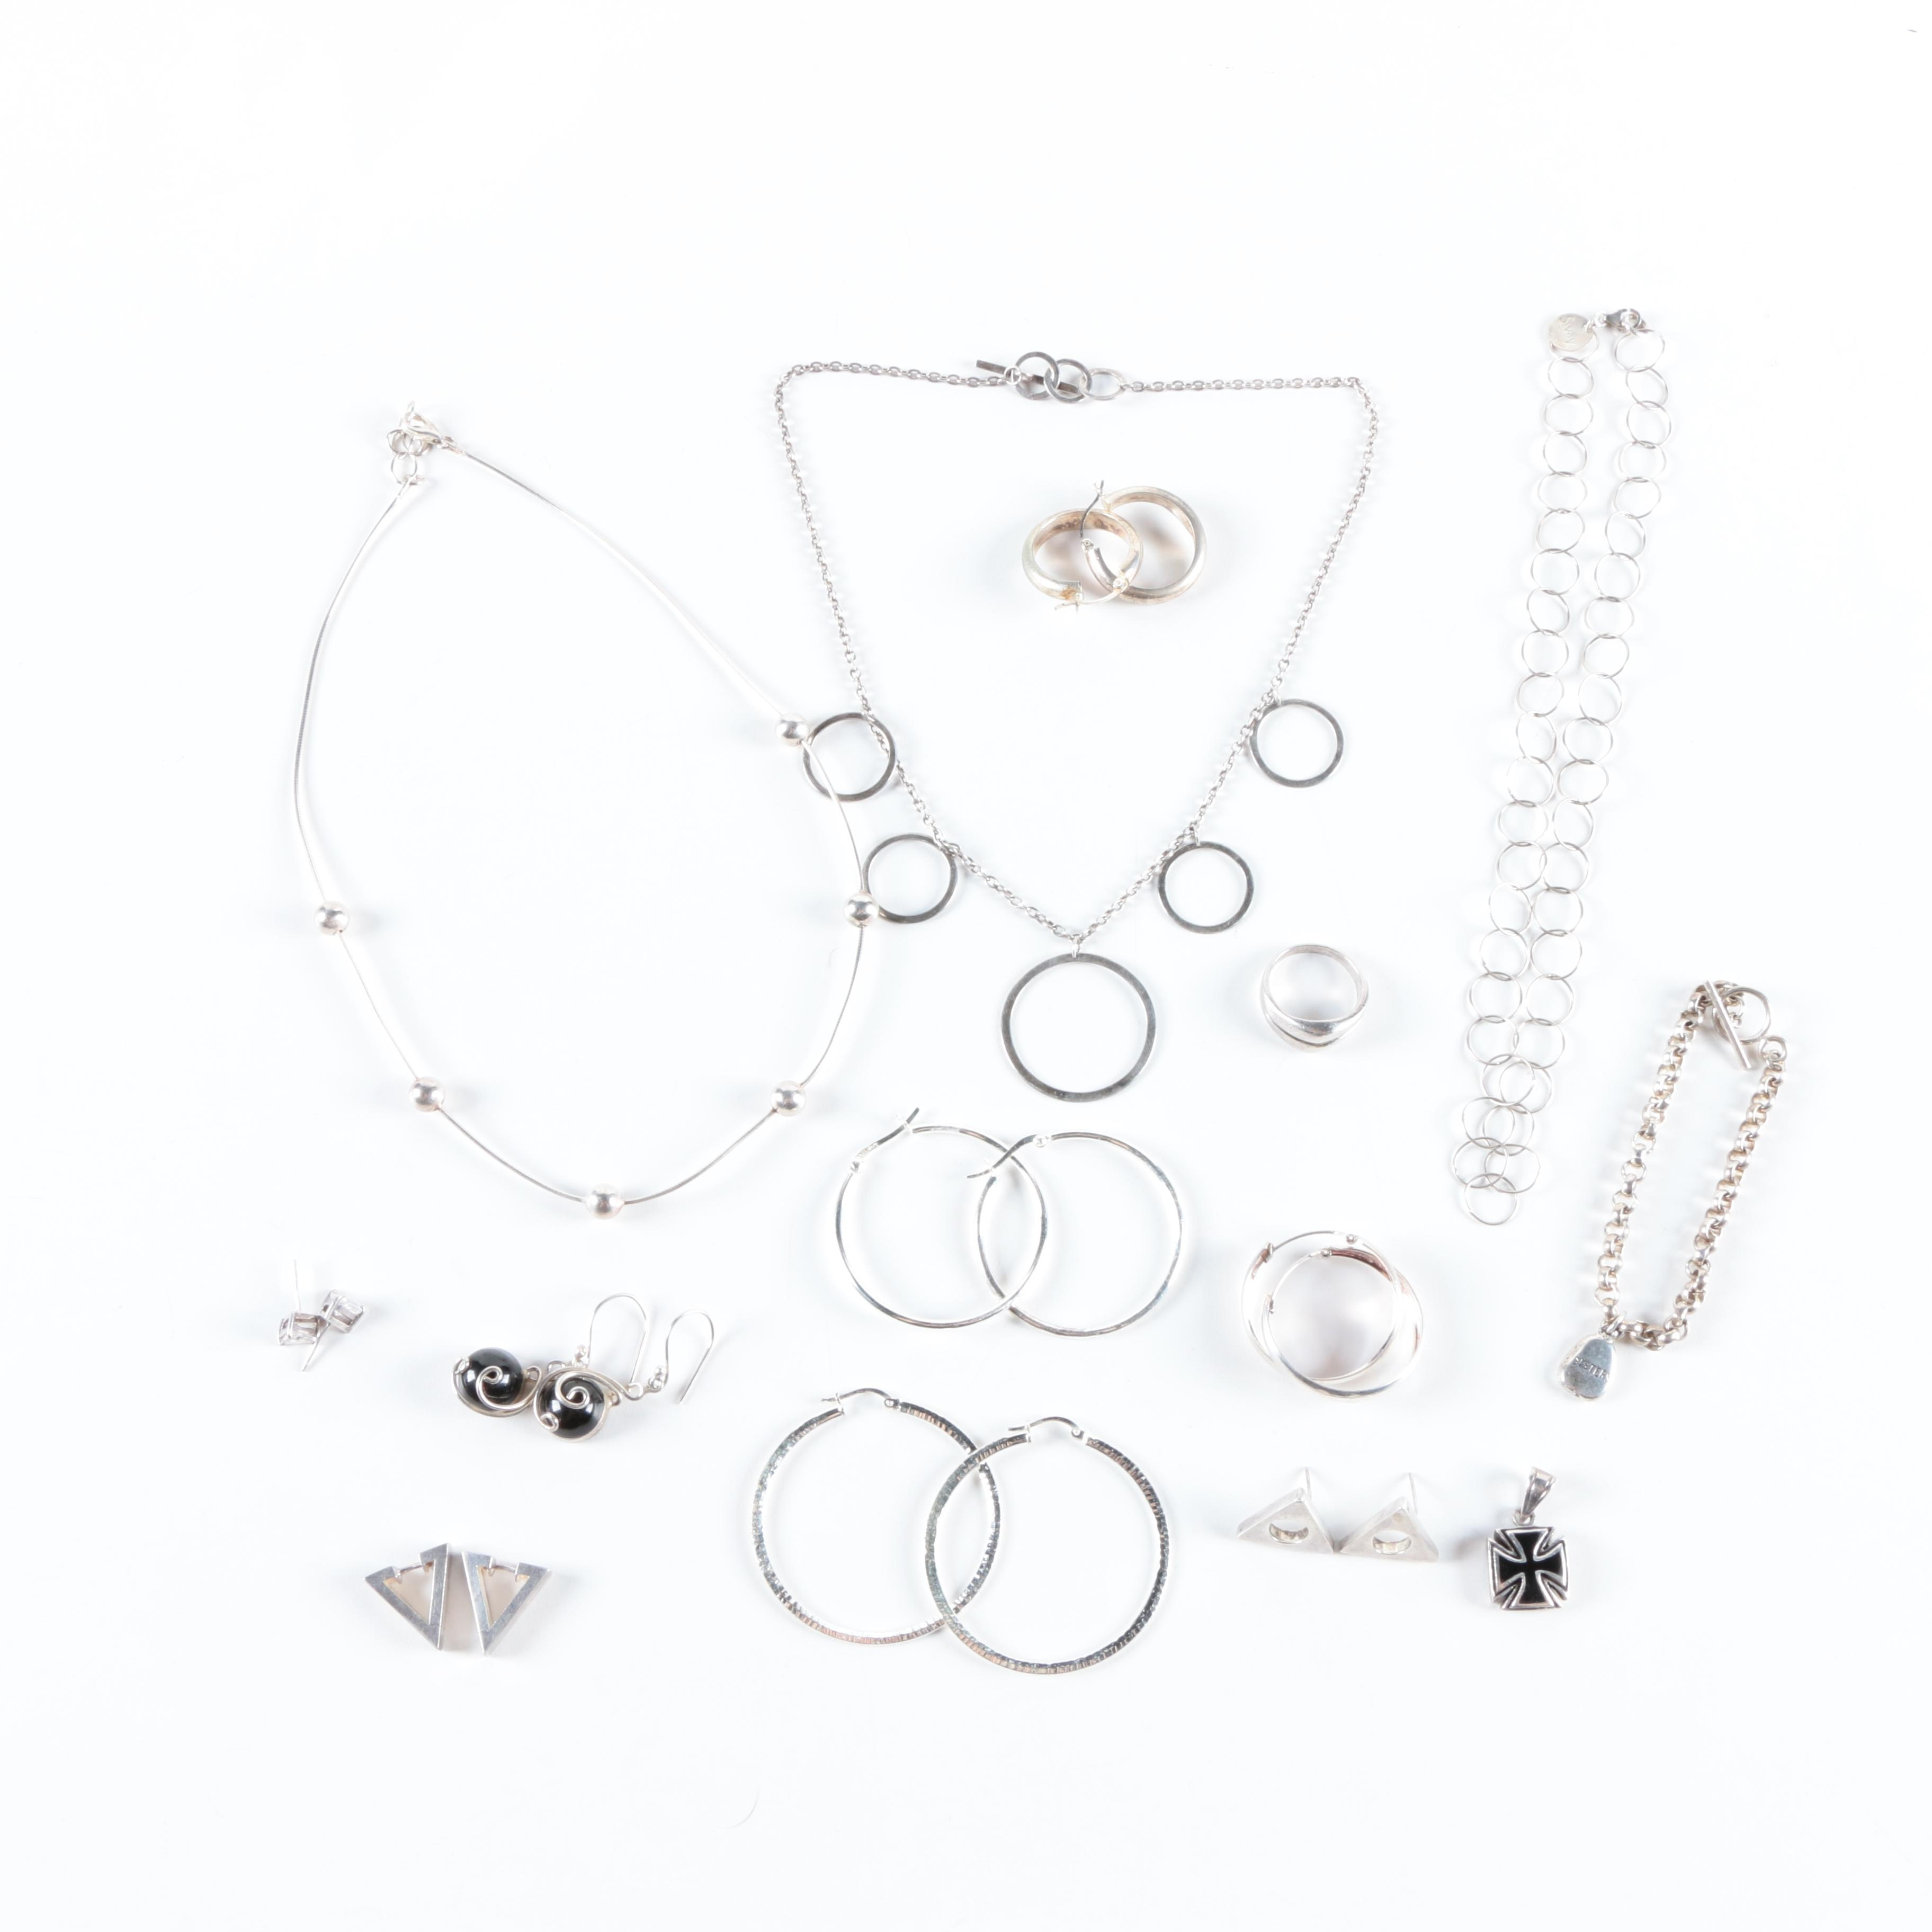 Geometric Sterling Silver Jewelry